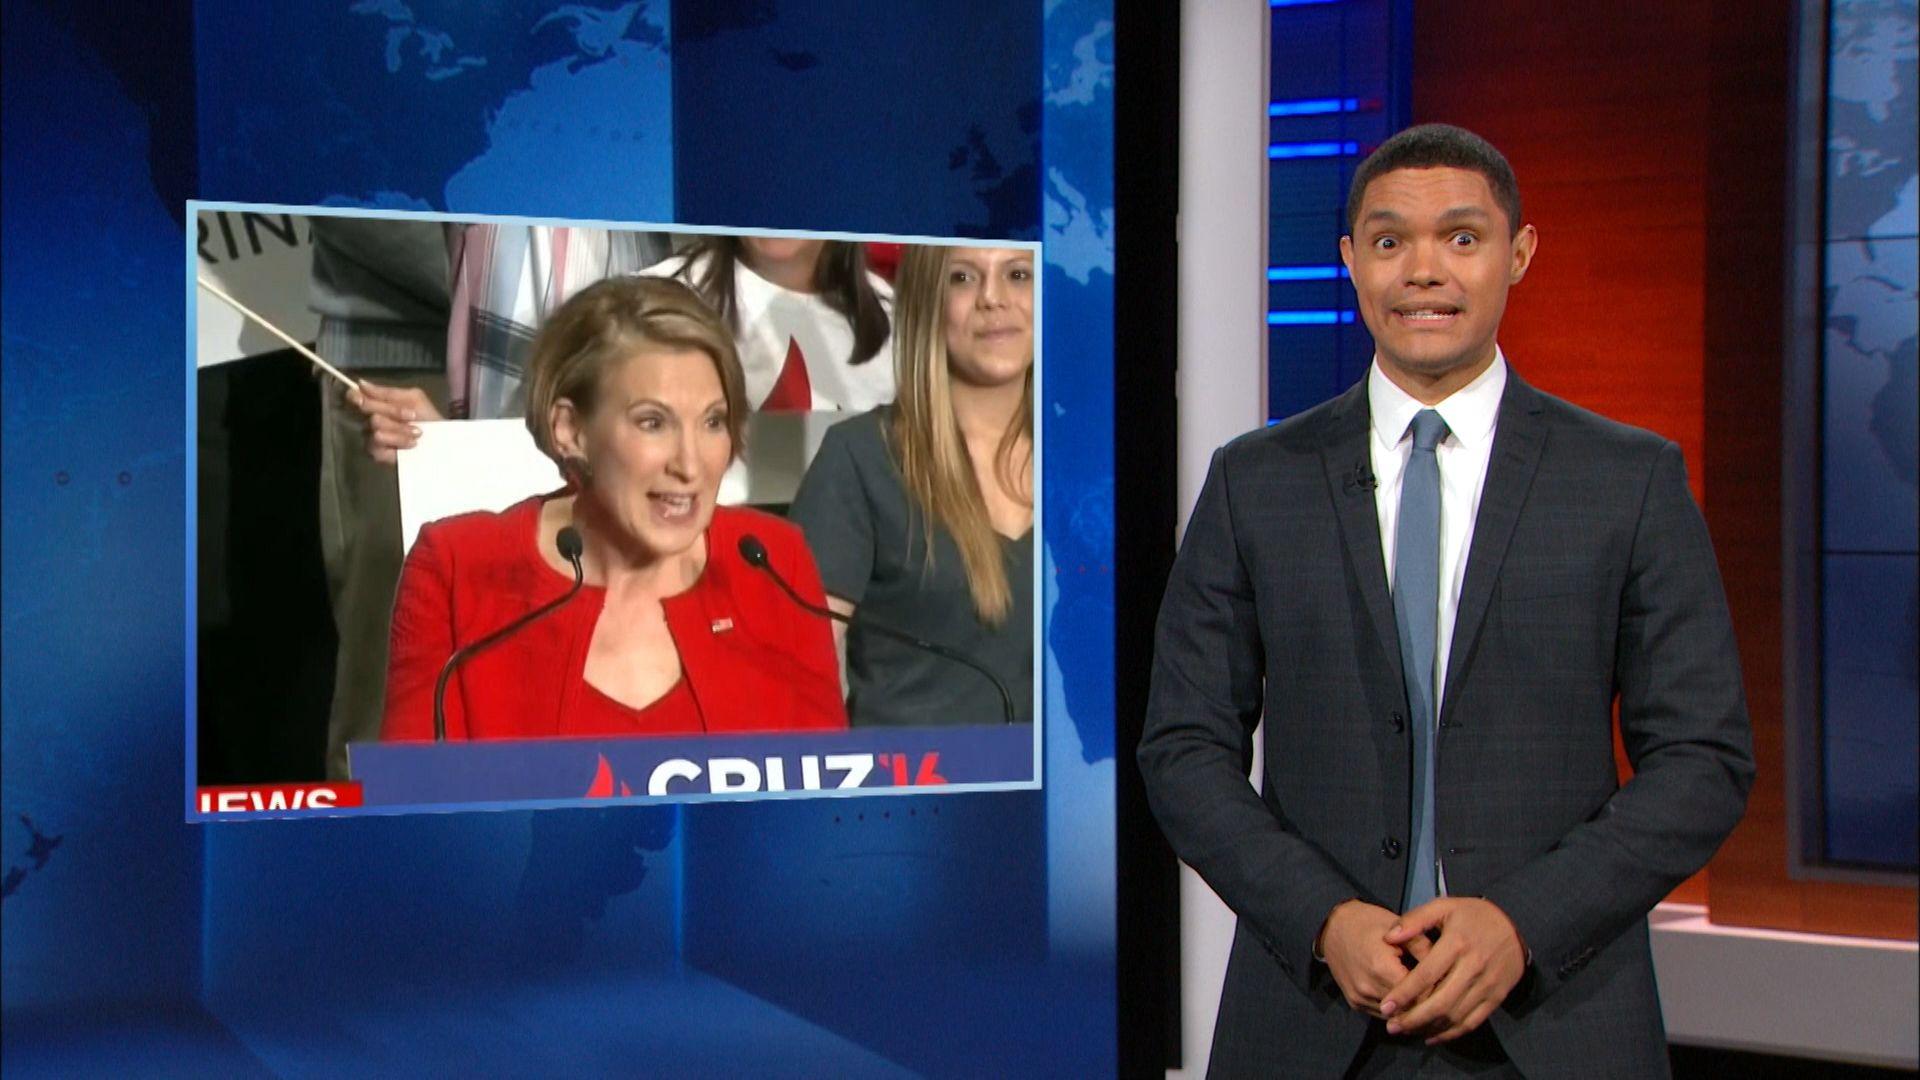 John Boehner Slams Ted Cruz & Carly Fiorina Sings a Terrifying Song - The Daily Show with Trevor Noah (Video Clip)